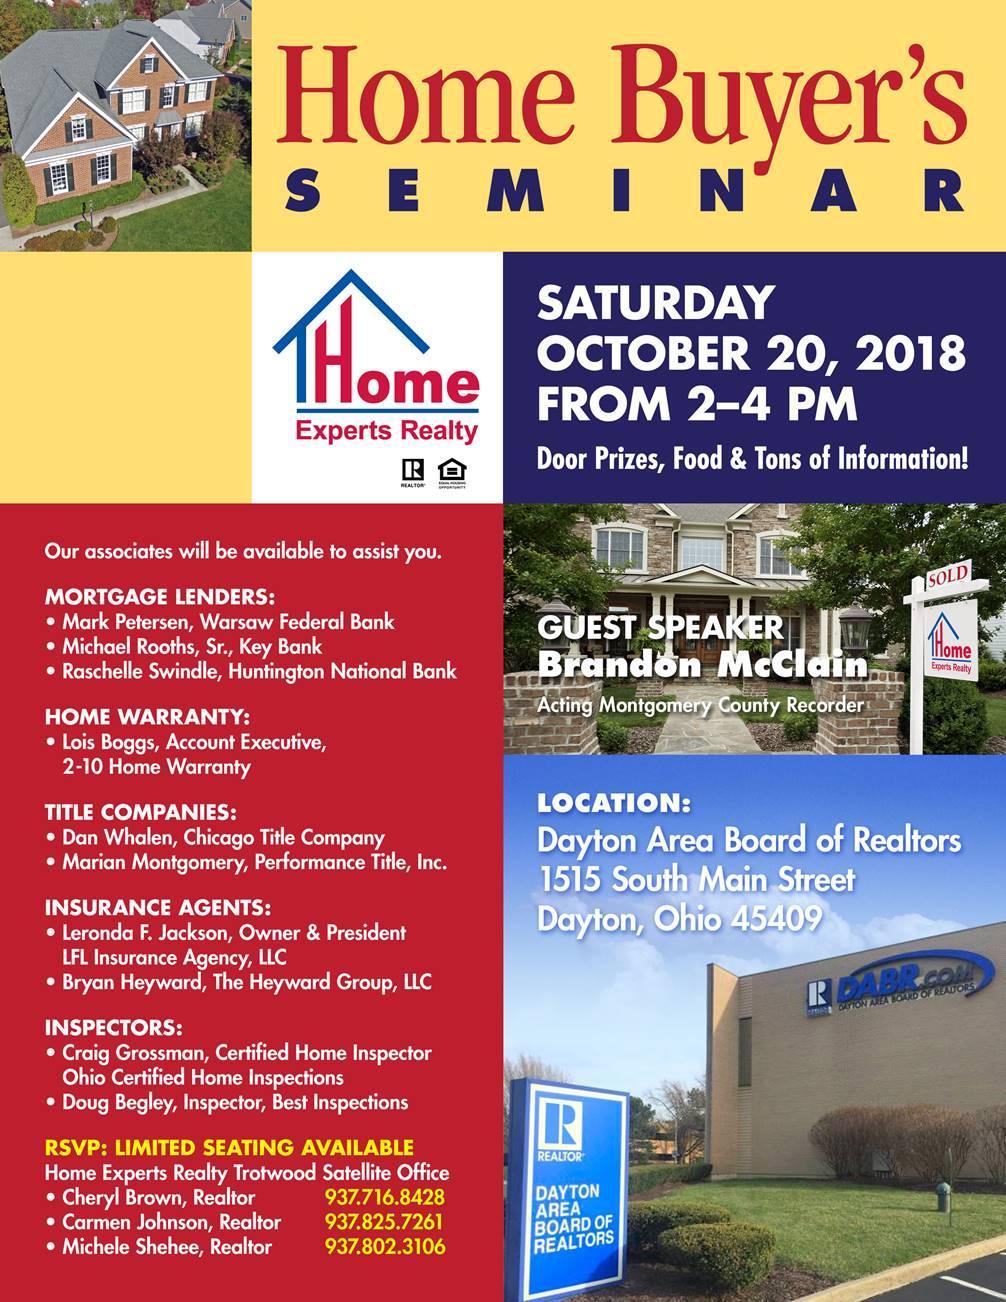 Home Buyers Seminar 2018